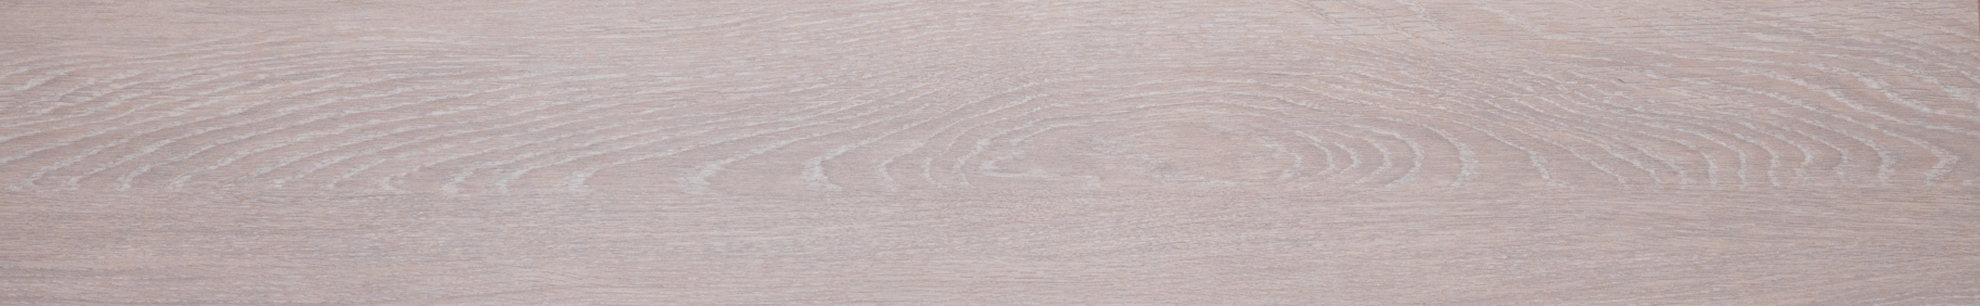 Виниловая плитка NOX EcoClick - EcoWood DryBack Дуб Лир